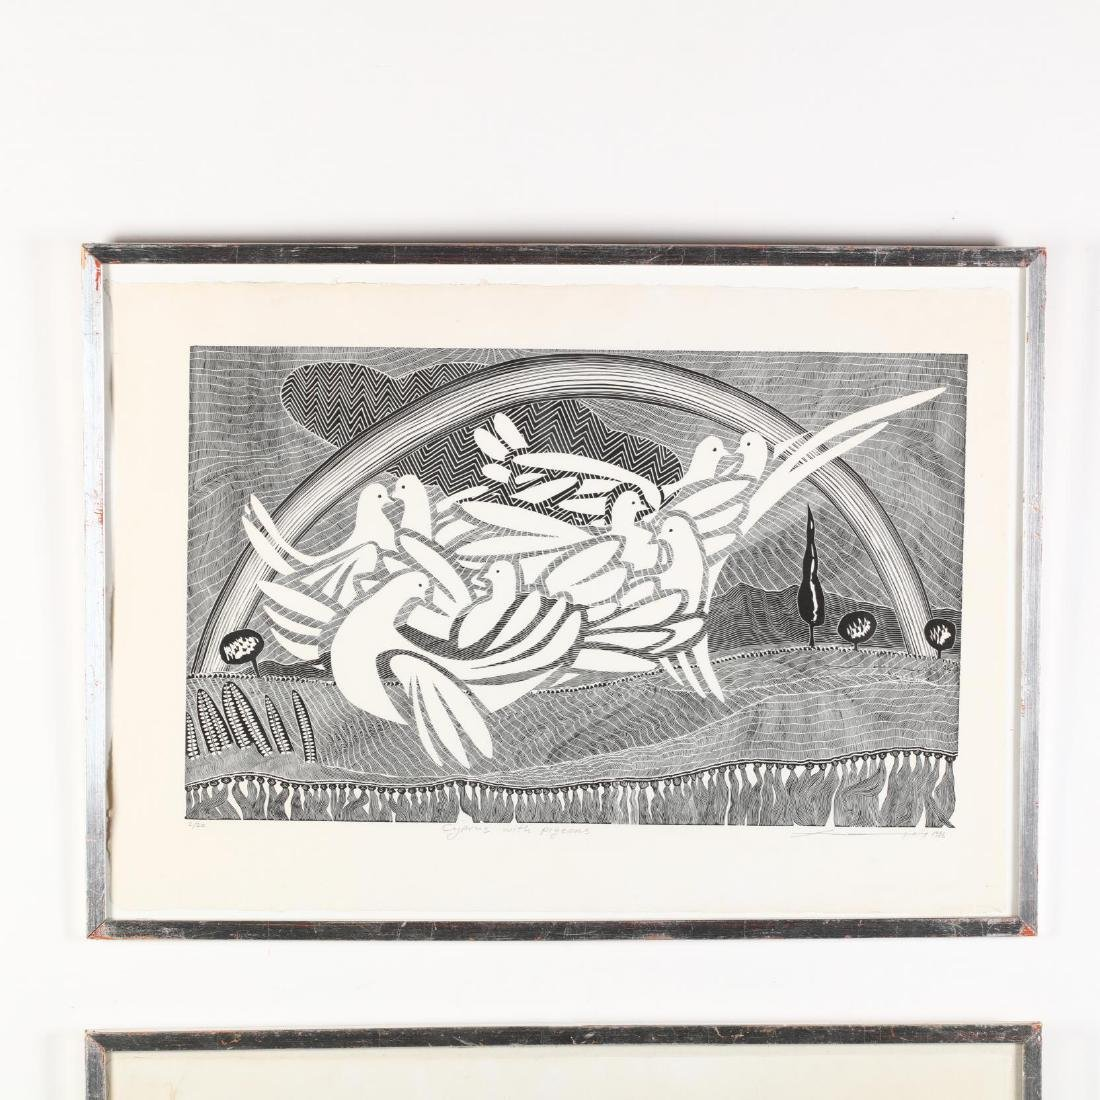 Hambis Tsangaris (Cypriot, b. 1947), Two Visions of - 2